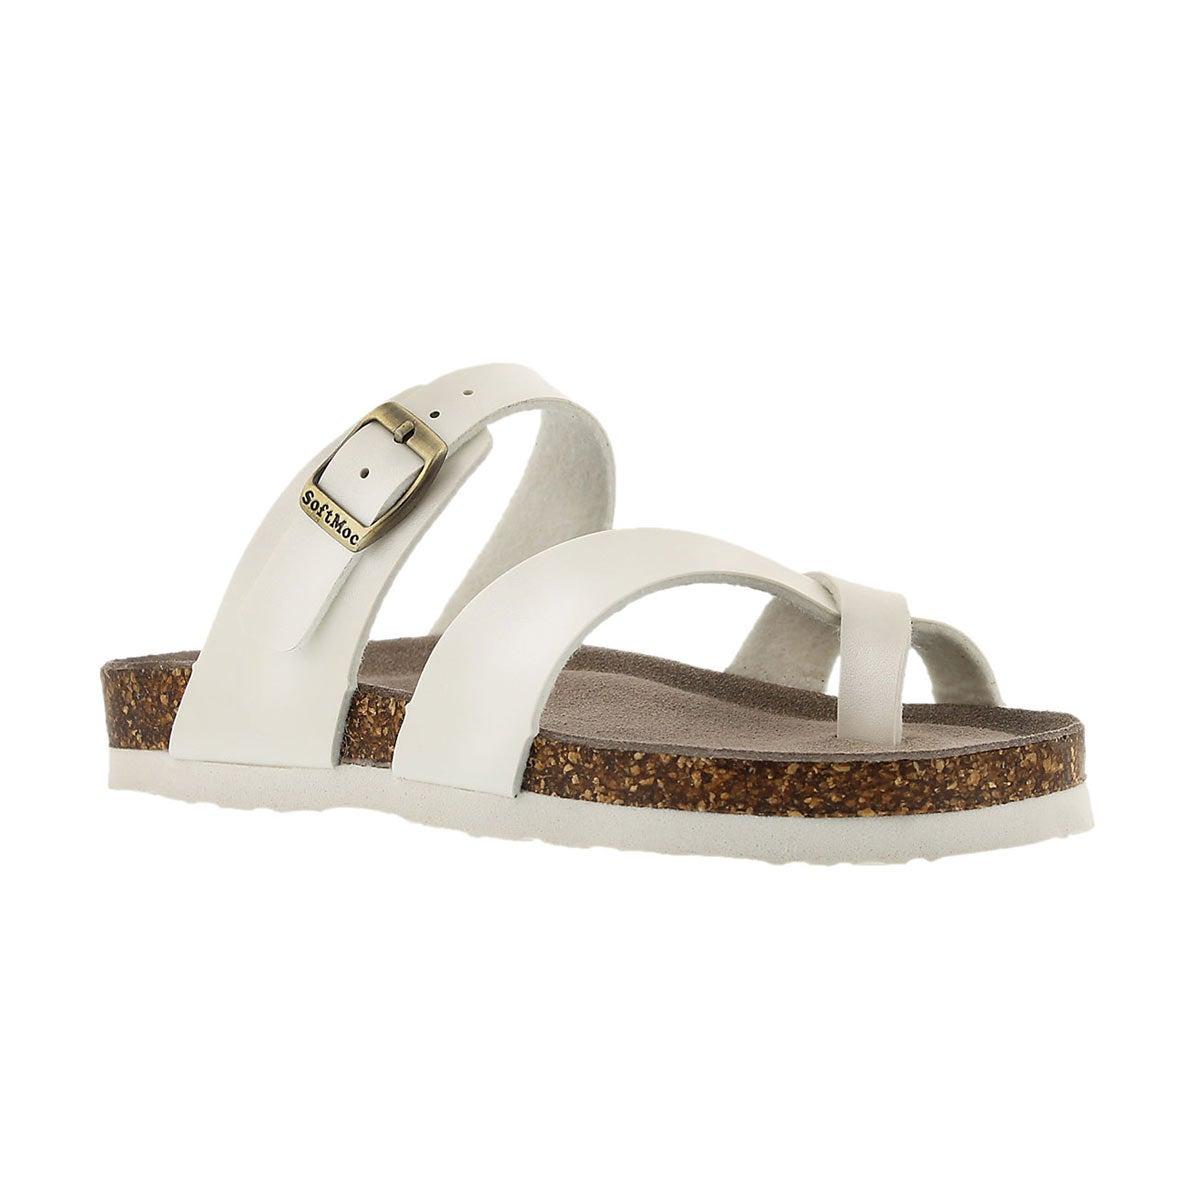 Grls Alicia moonstone toe loop sandal